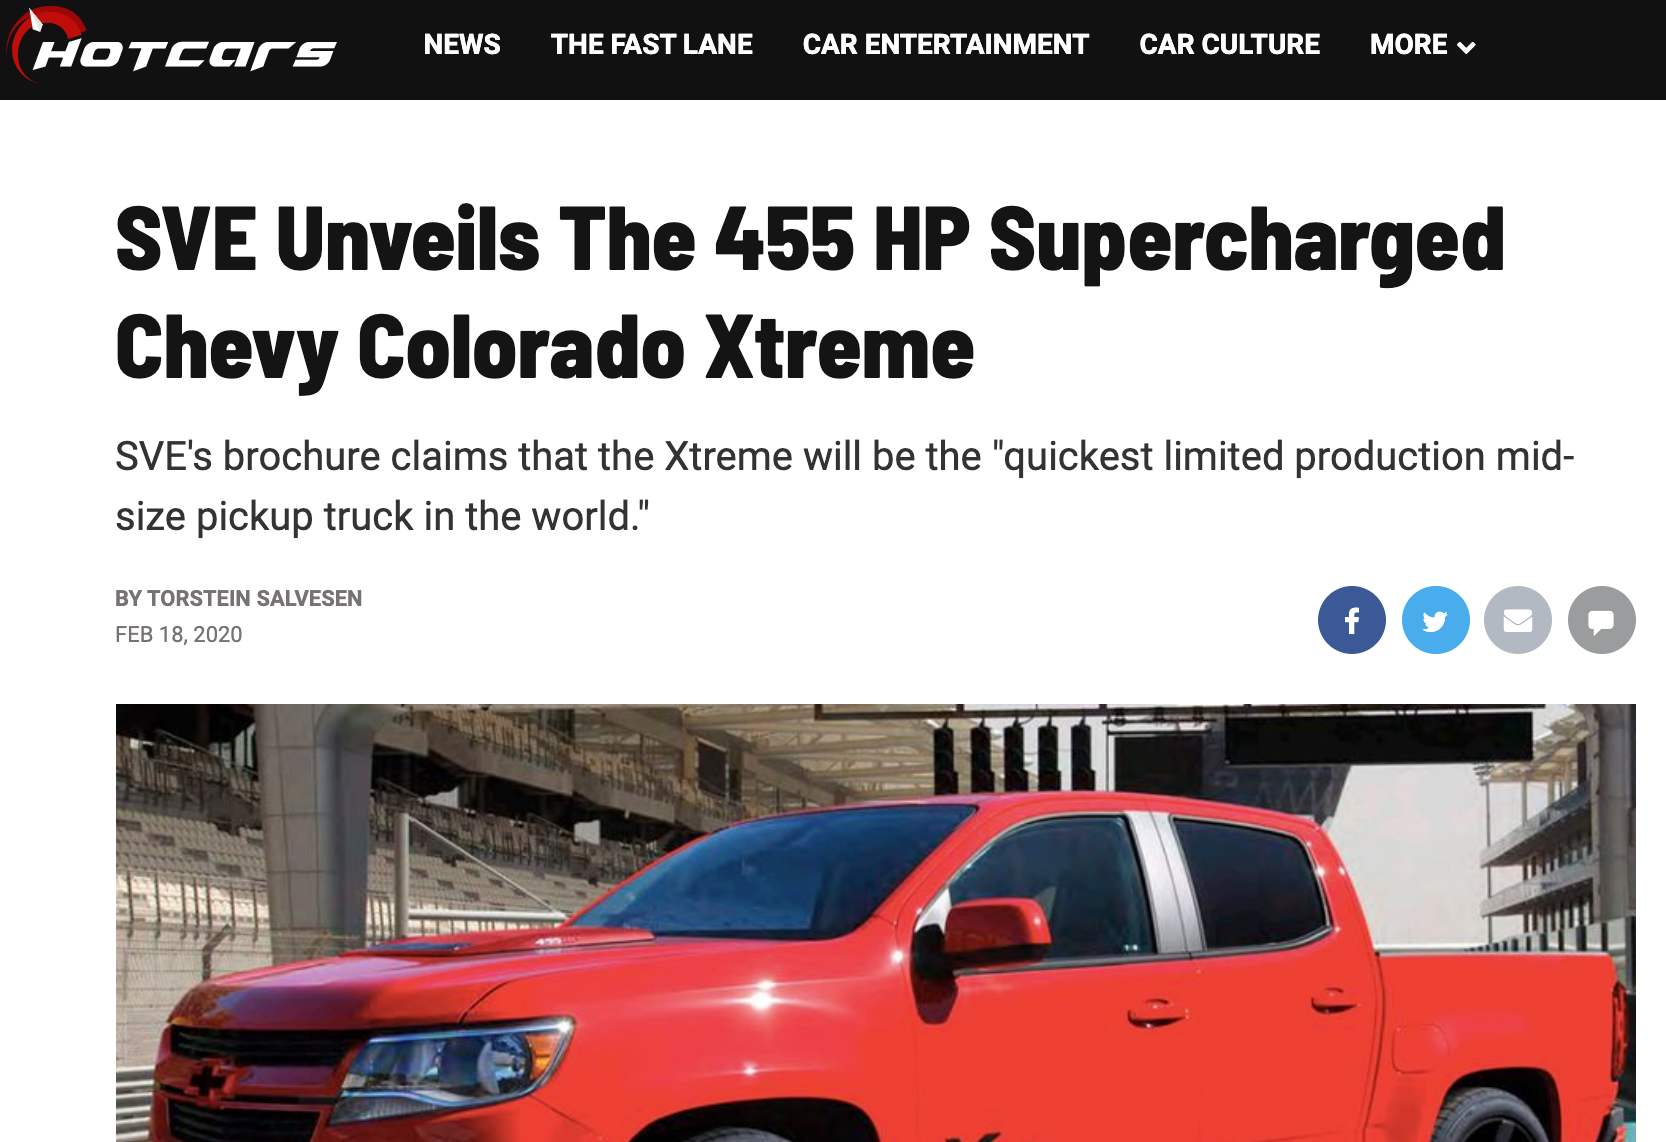 Hot Cars article - eReleases press release service SVE Case Study